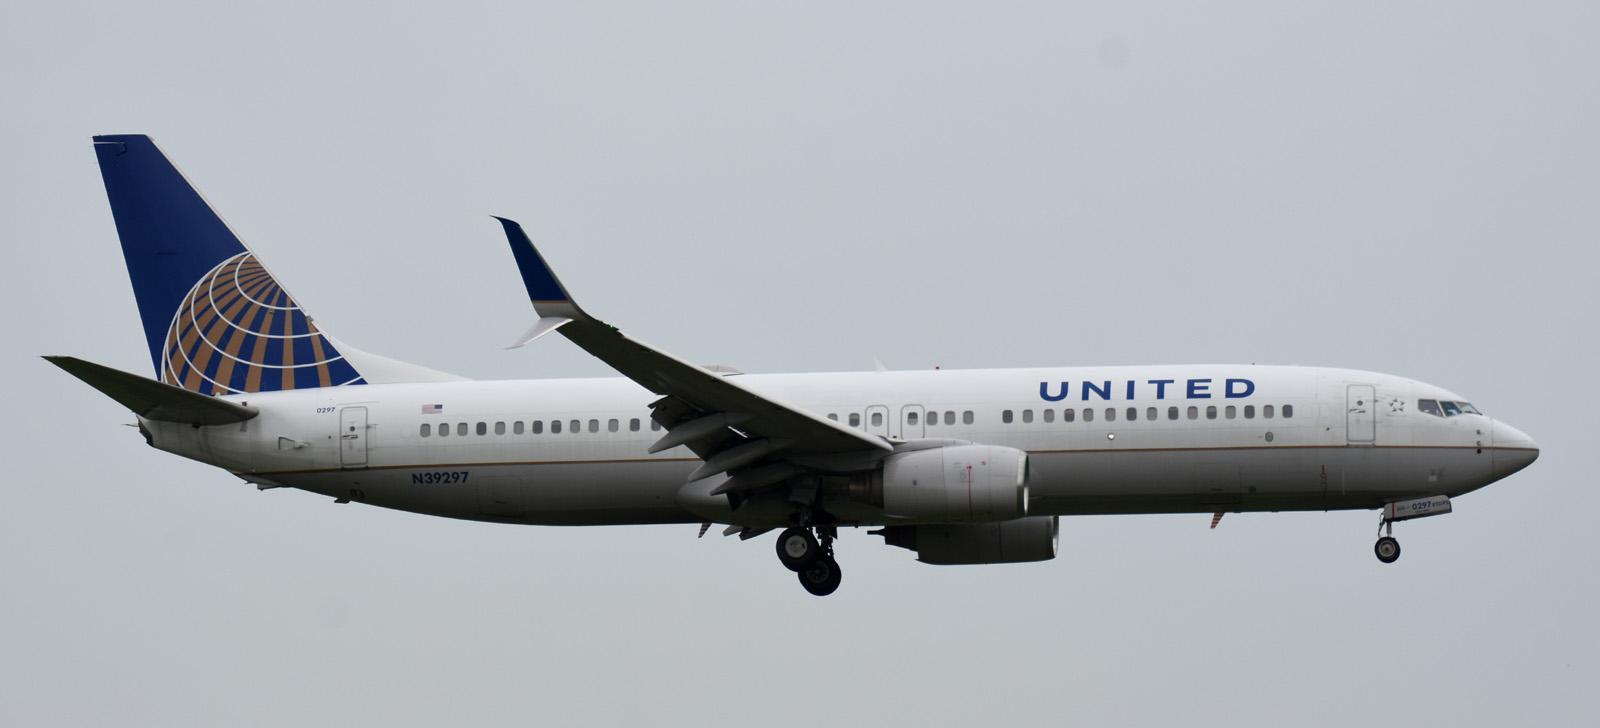 United170920g815